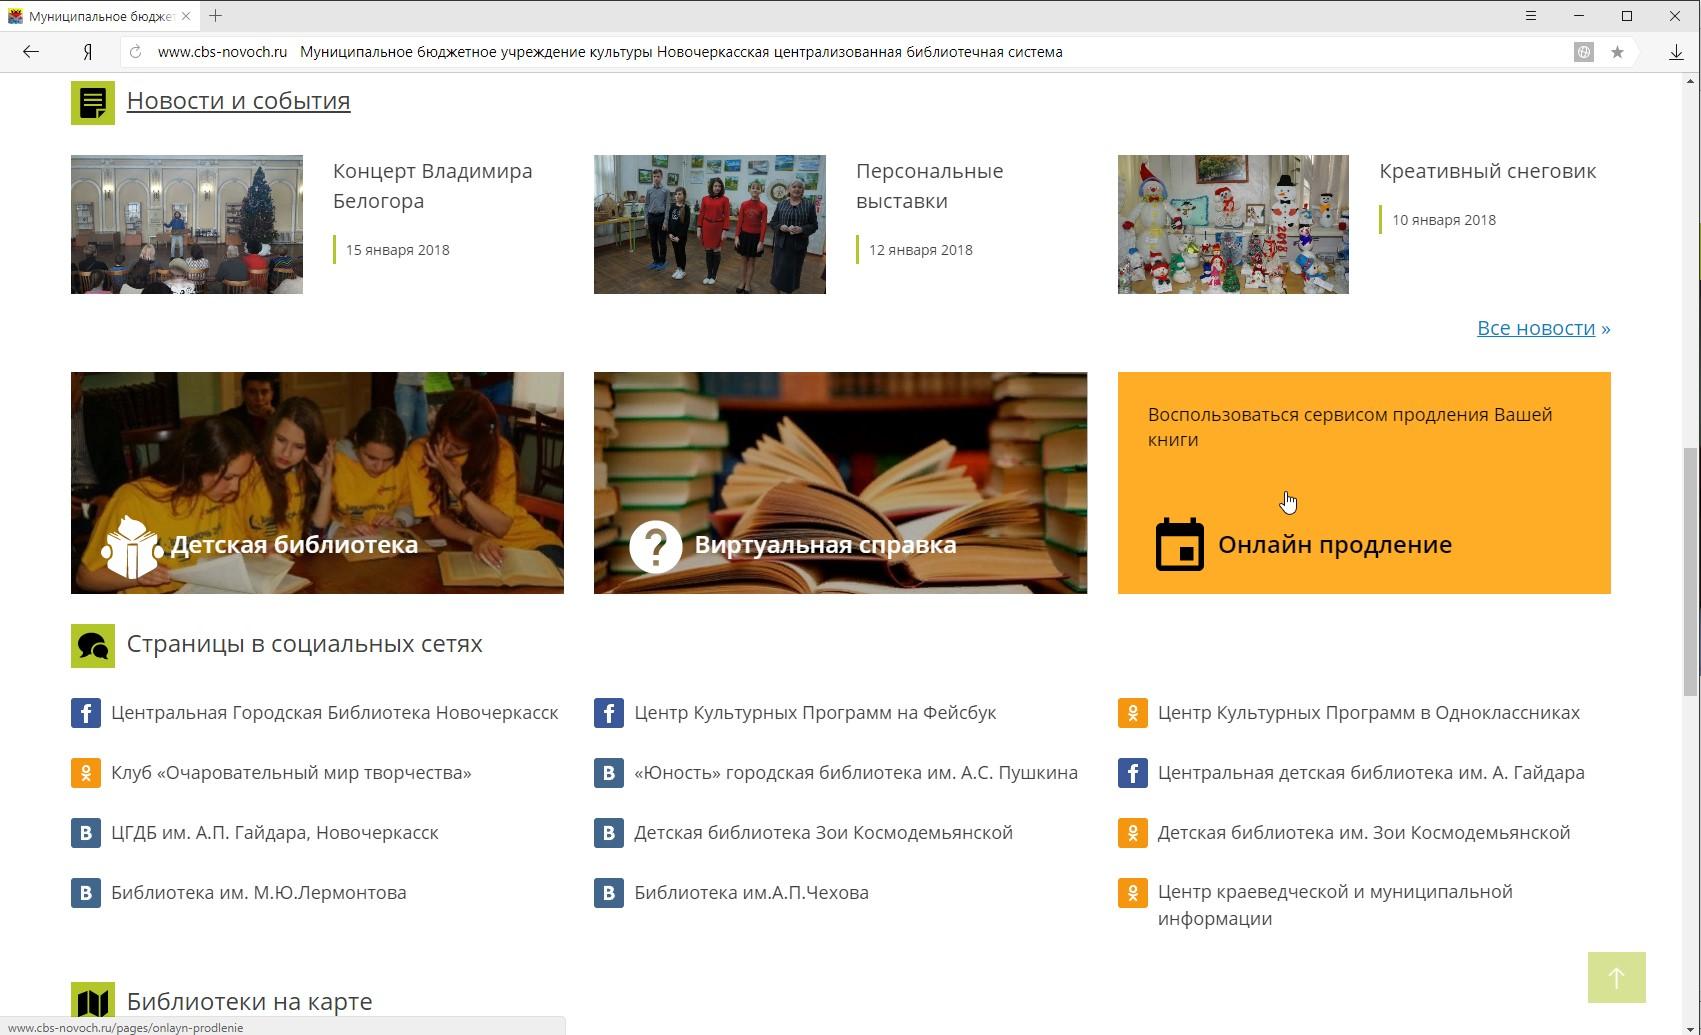 Ссылки на электронные сервисы сайта www.cbs-novoch.ru